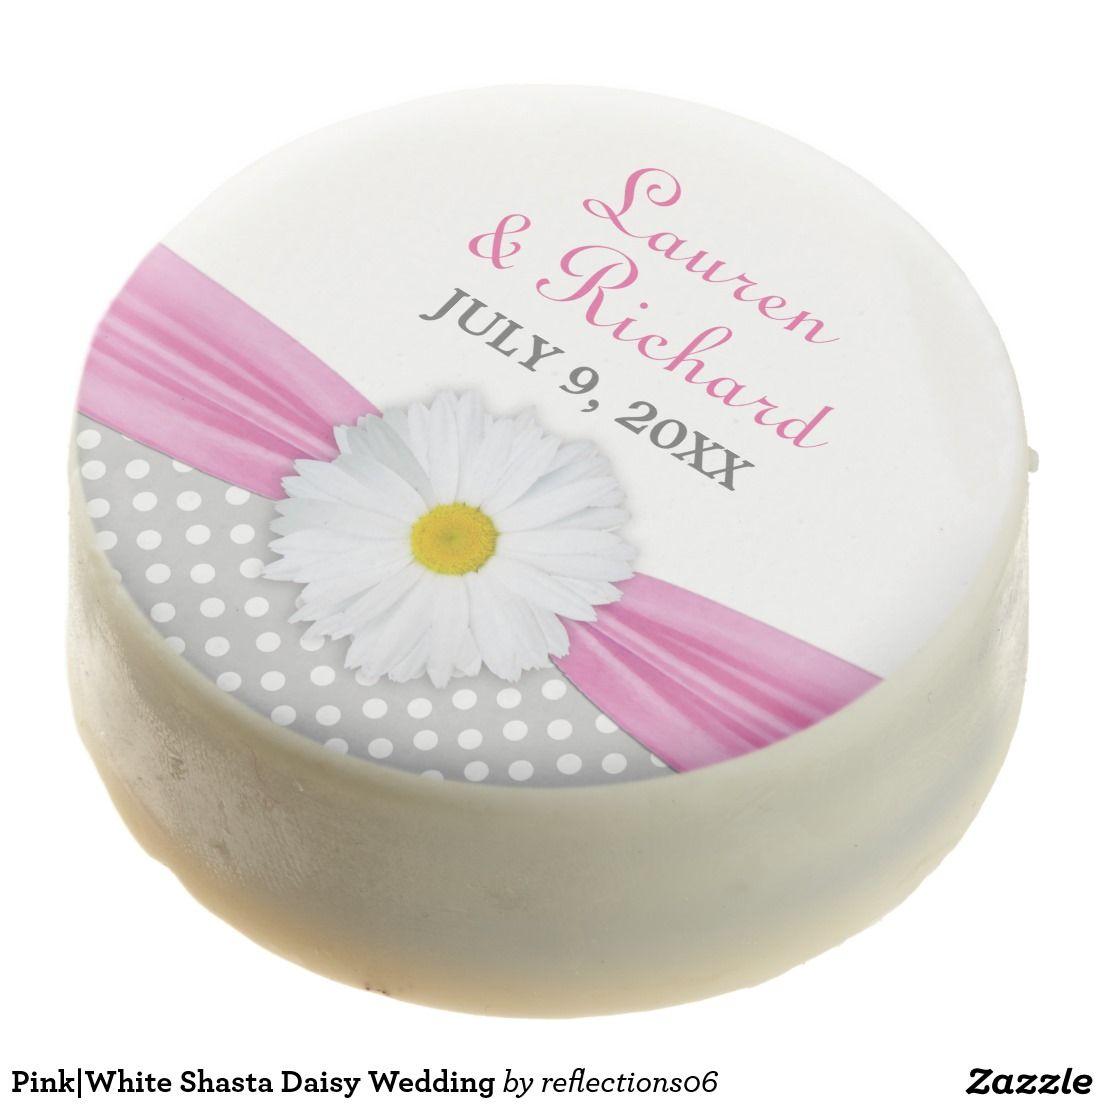 Pink|White Shasta Daisy Wedding Chocolate Dipped Oreo | Wedding ...